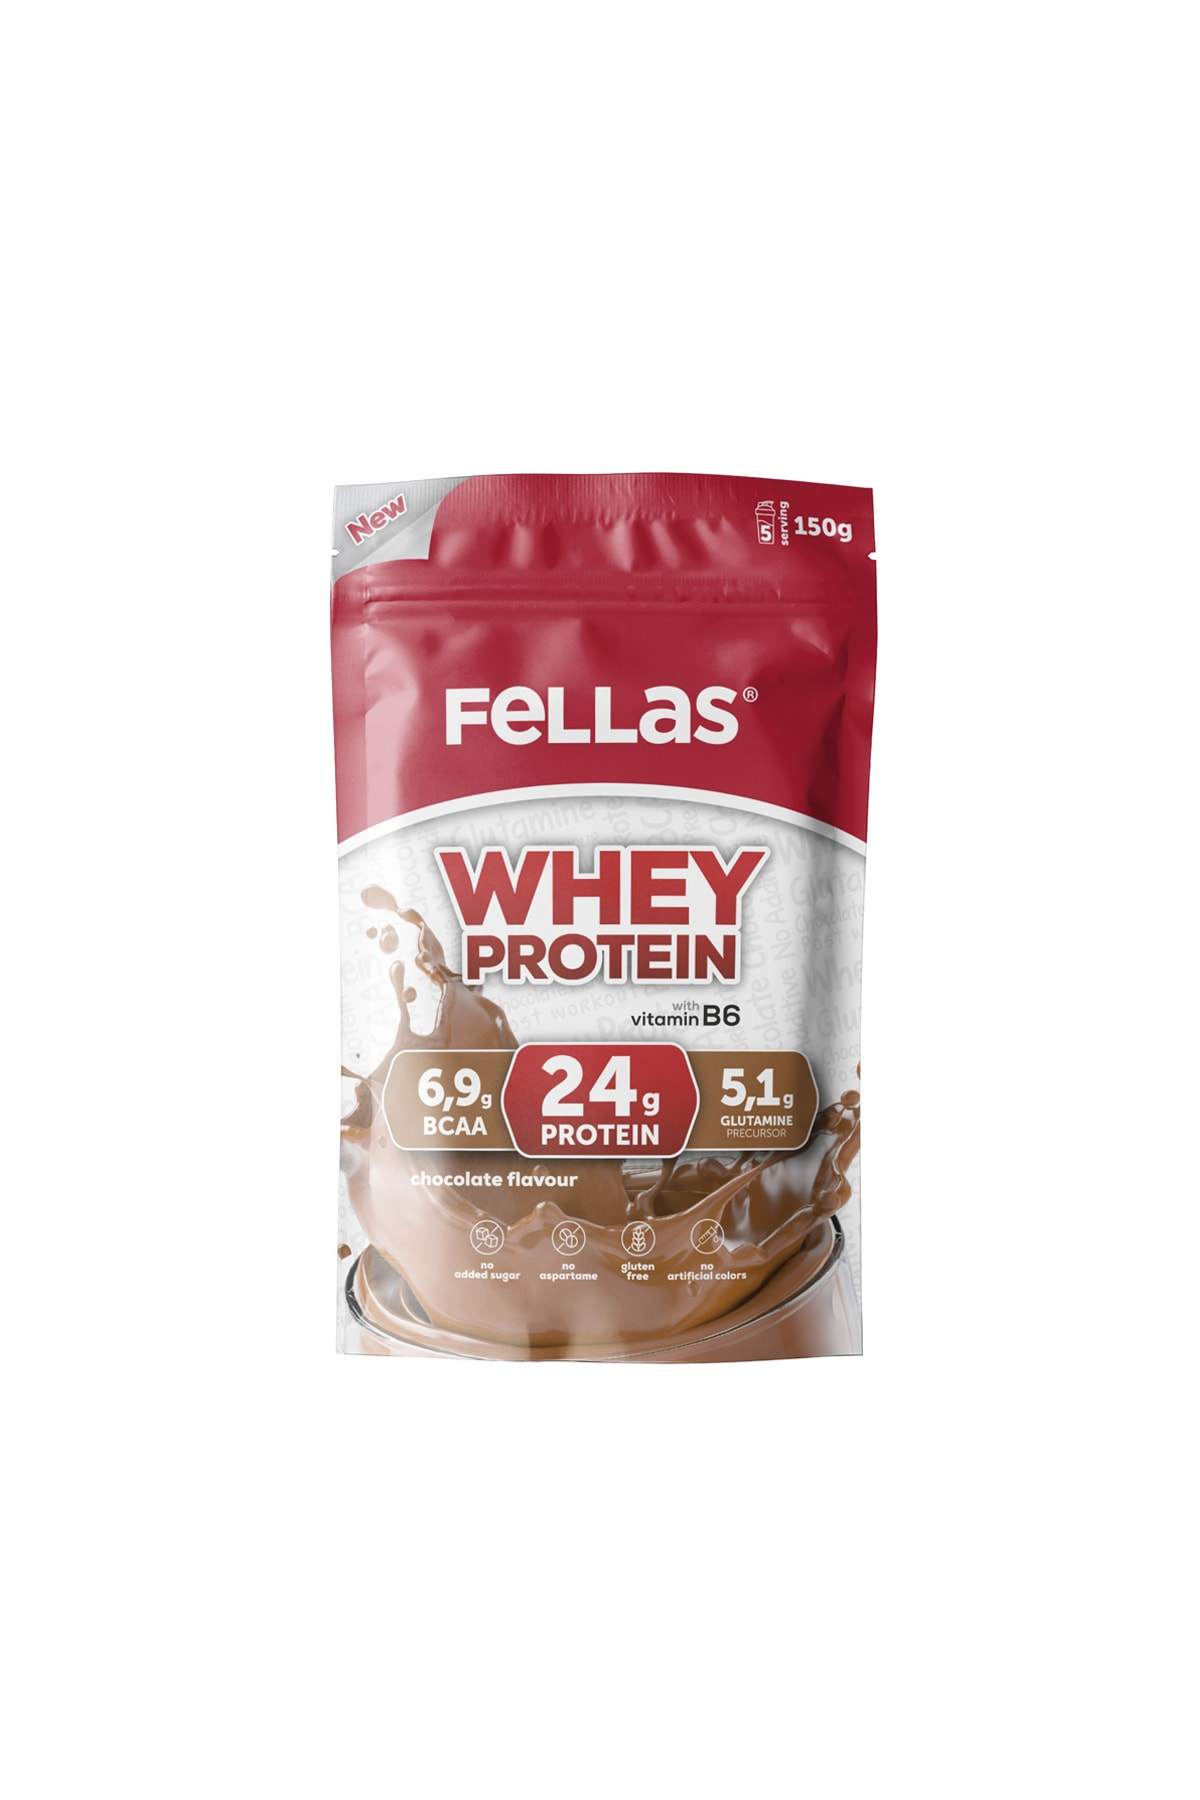 Çikolata Aromalı Protein Tozu 150 g  5 Porsiyon - Çikolata Aromalı